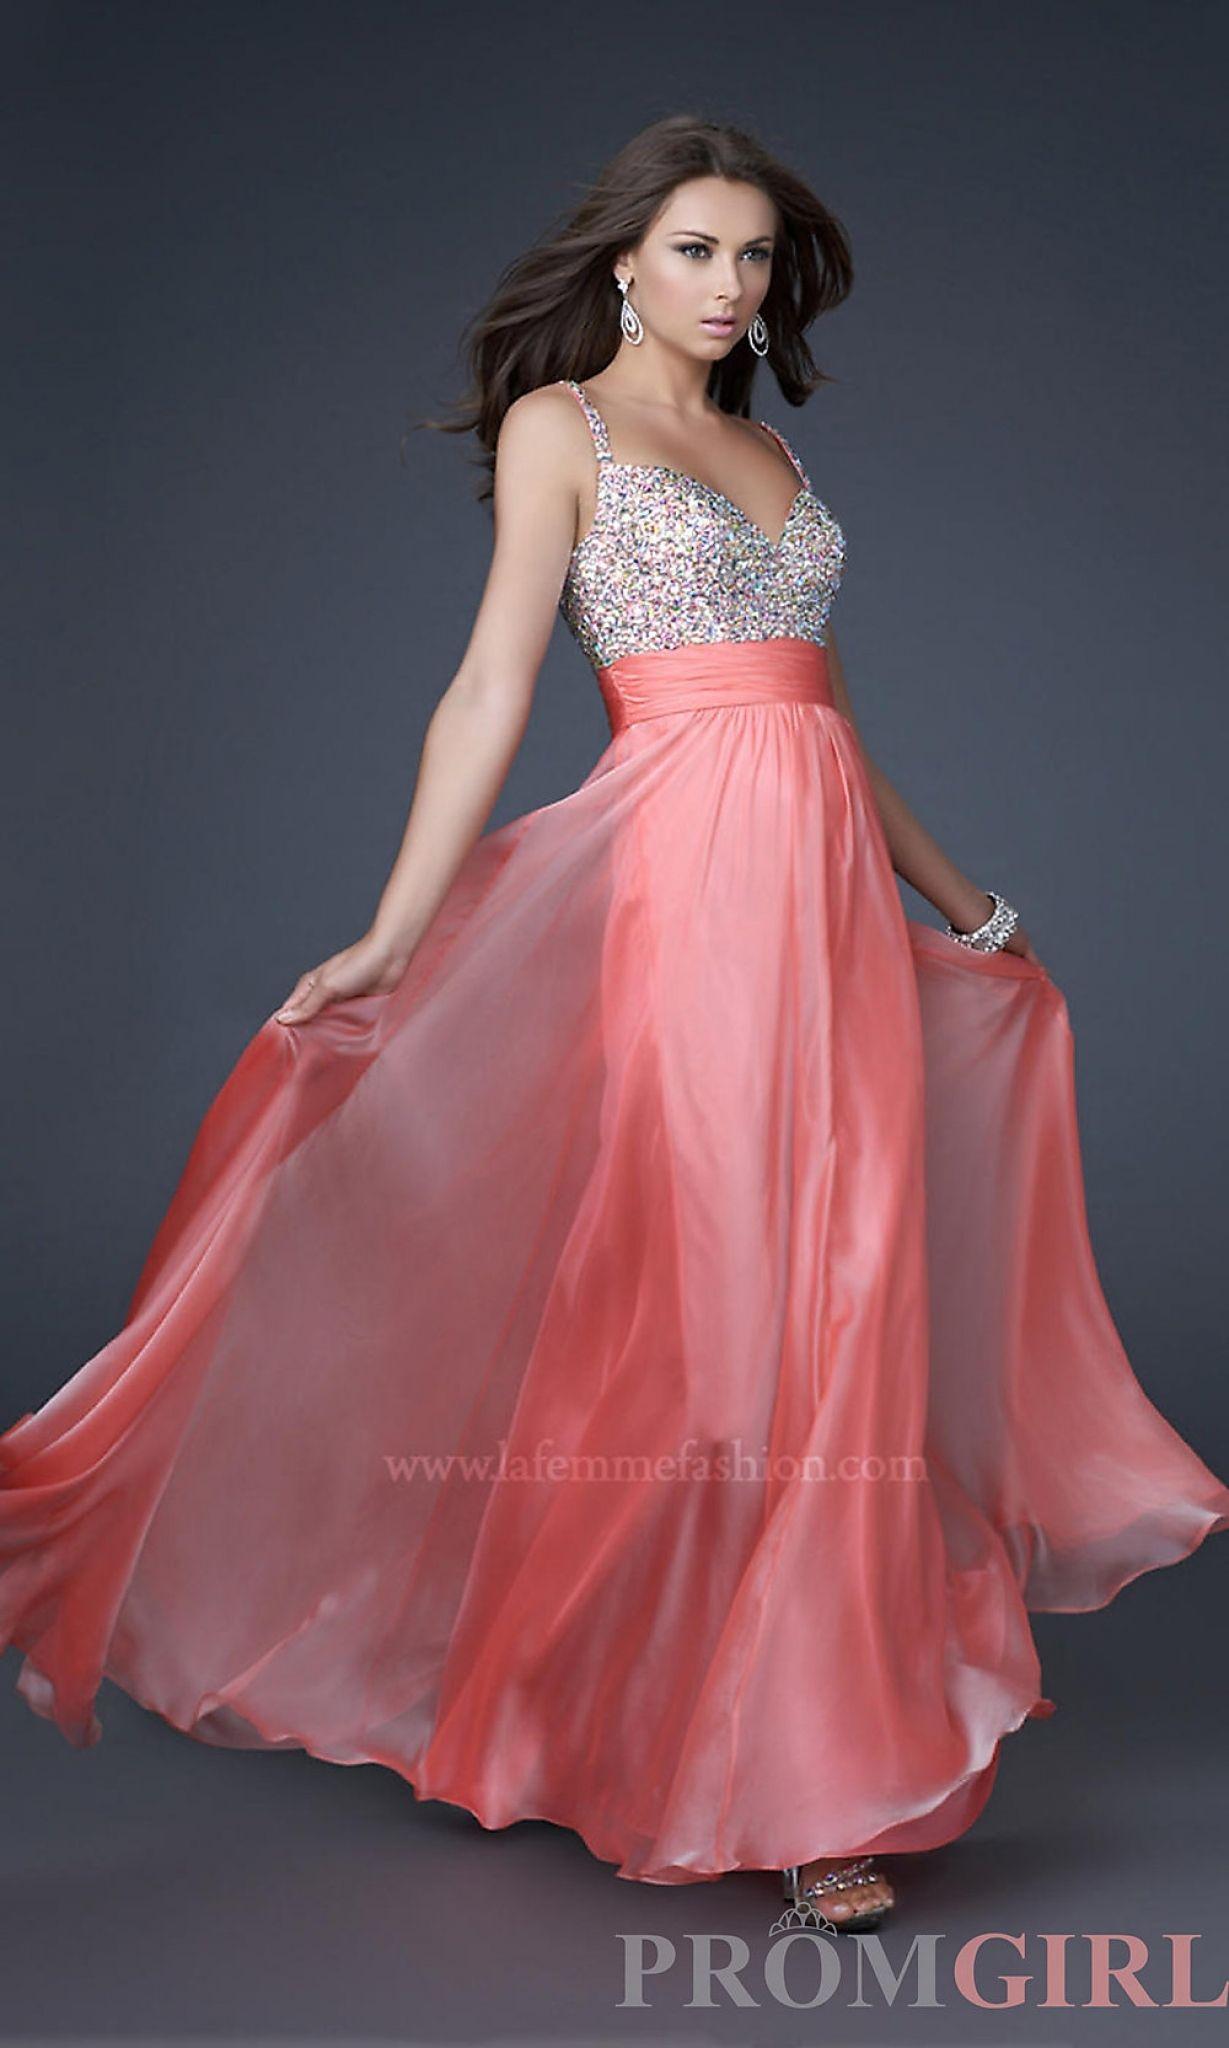 Wedding dress for pear shaped  fancy dresses for wedding  best wedding dress for pear shaped Check